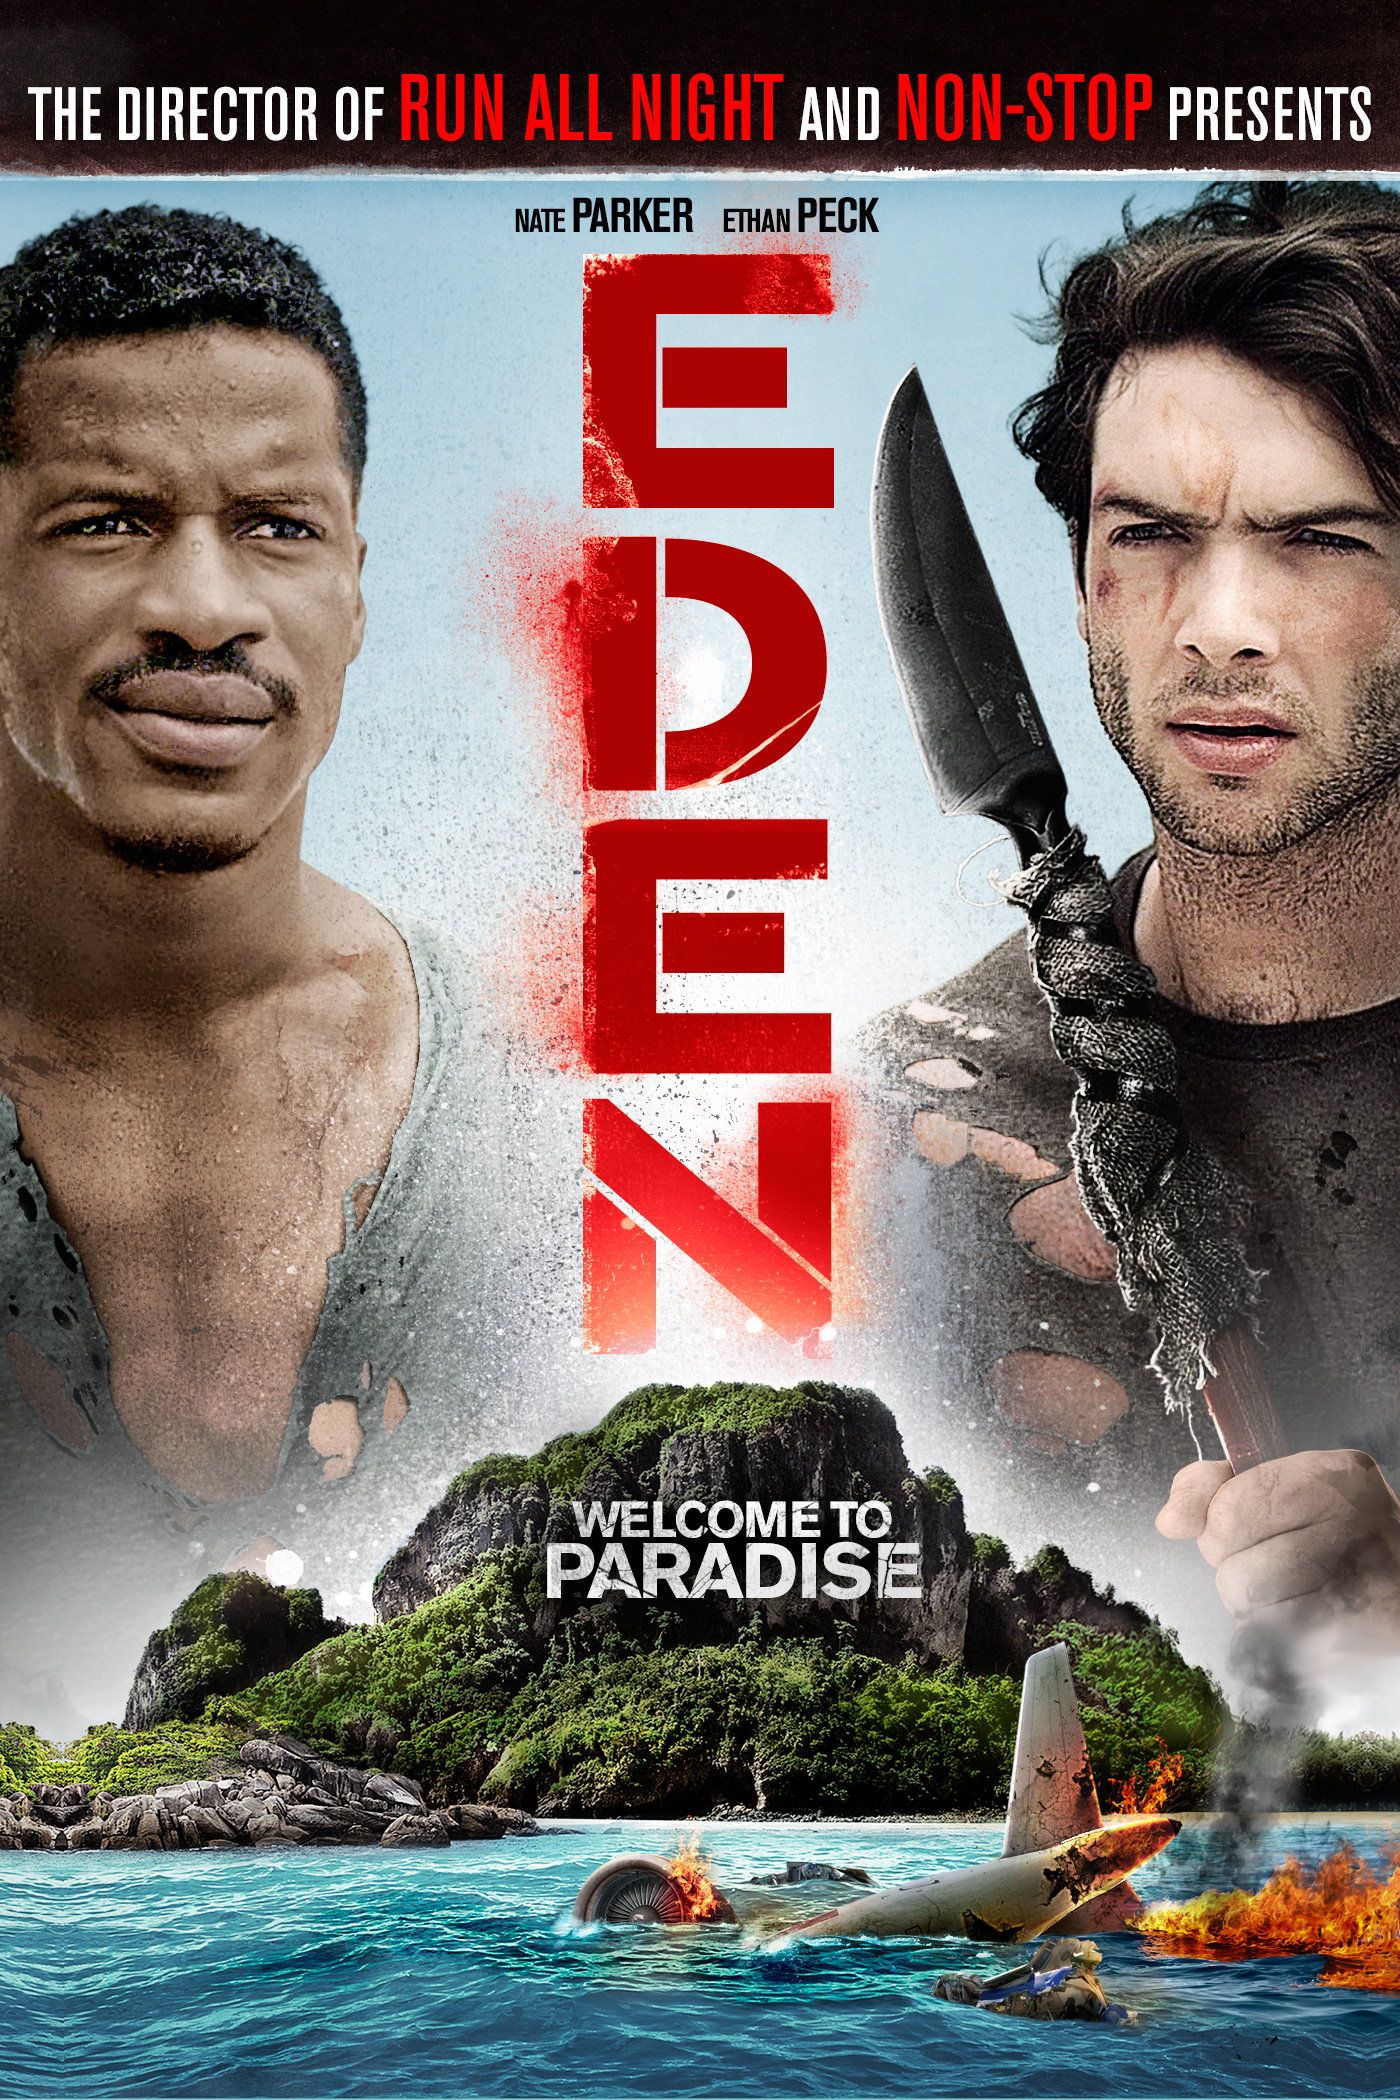 run full movie free download hd